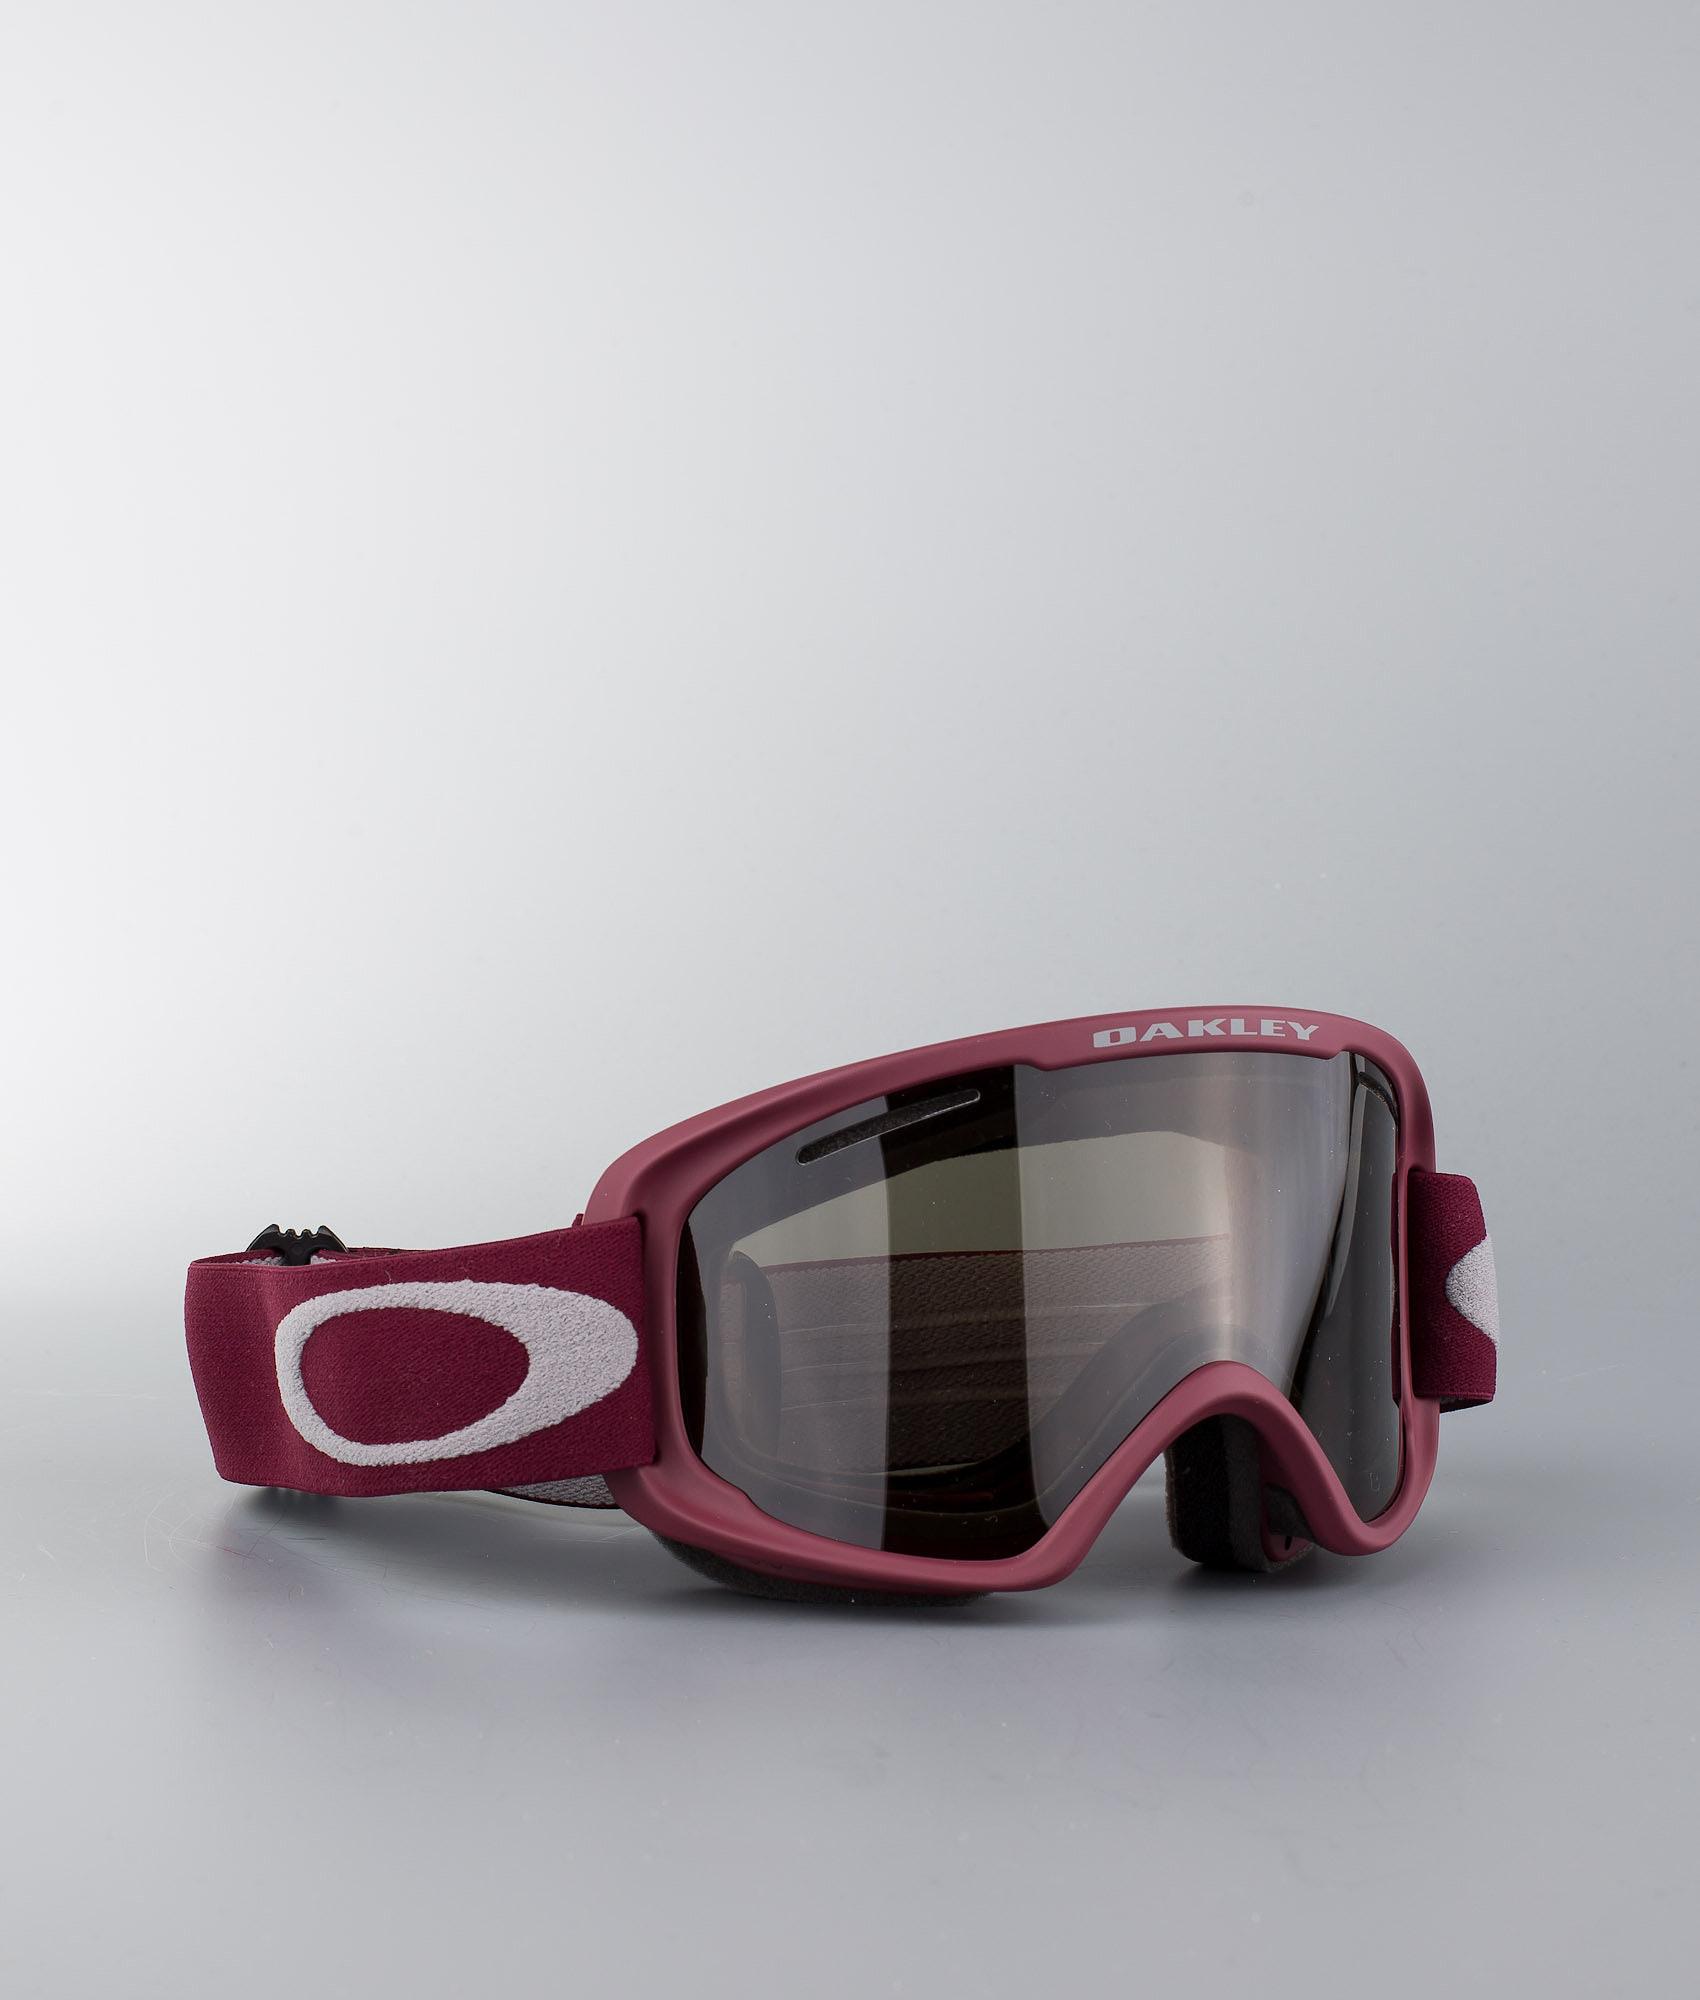 b829f160eb Oakley O Frame 2.0 Xm Ski Goggle Port Sharkskin W Dark Grey ...